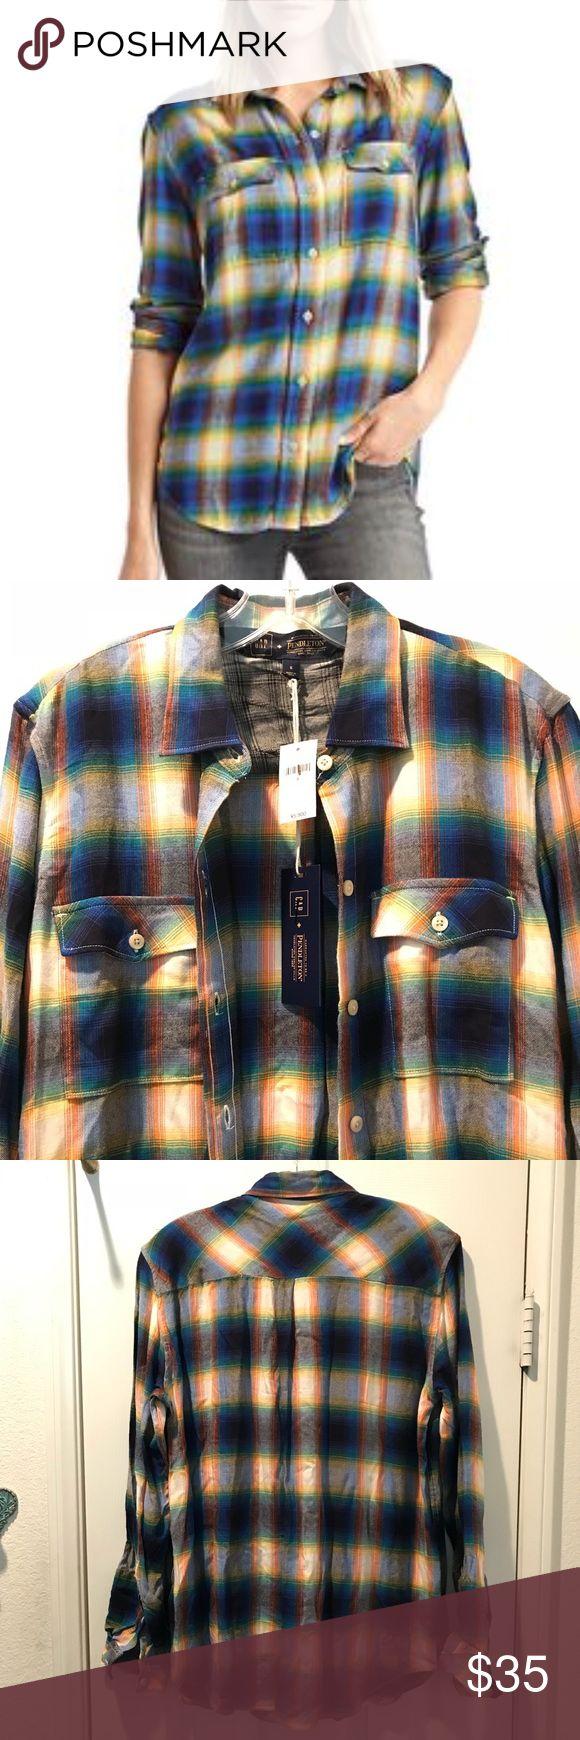 GAP & Pendleton plaid boyfriend shirt (NWT) GAP & Pendleton flannel boyfriend shirt. Super soft & cozy! 100% rayon/viscose Gap & Pendleton Tops Button Down Shirts